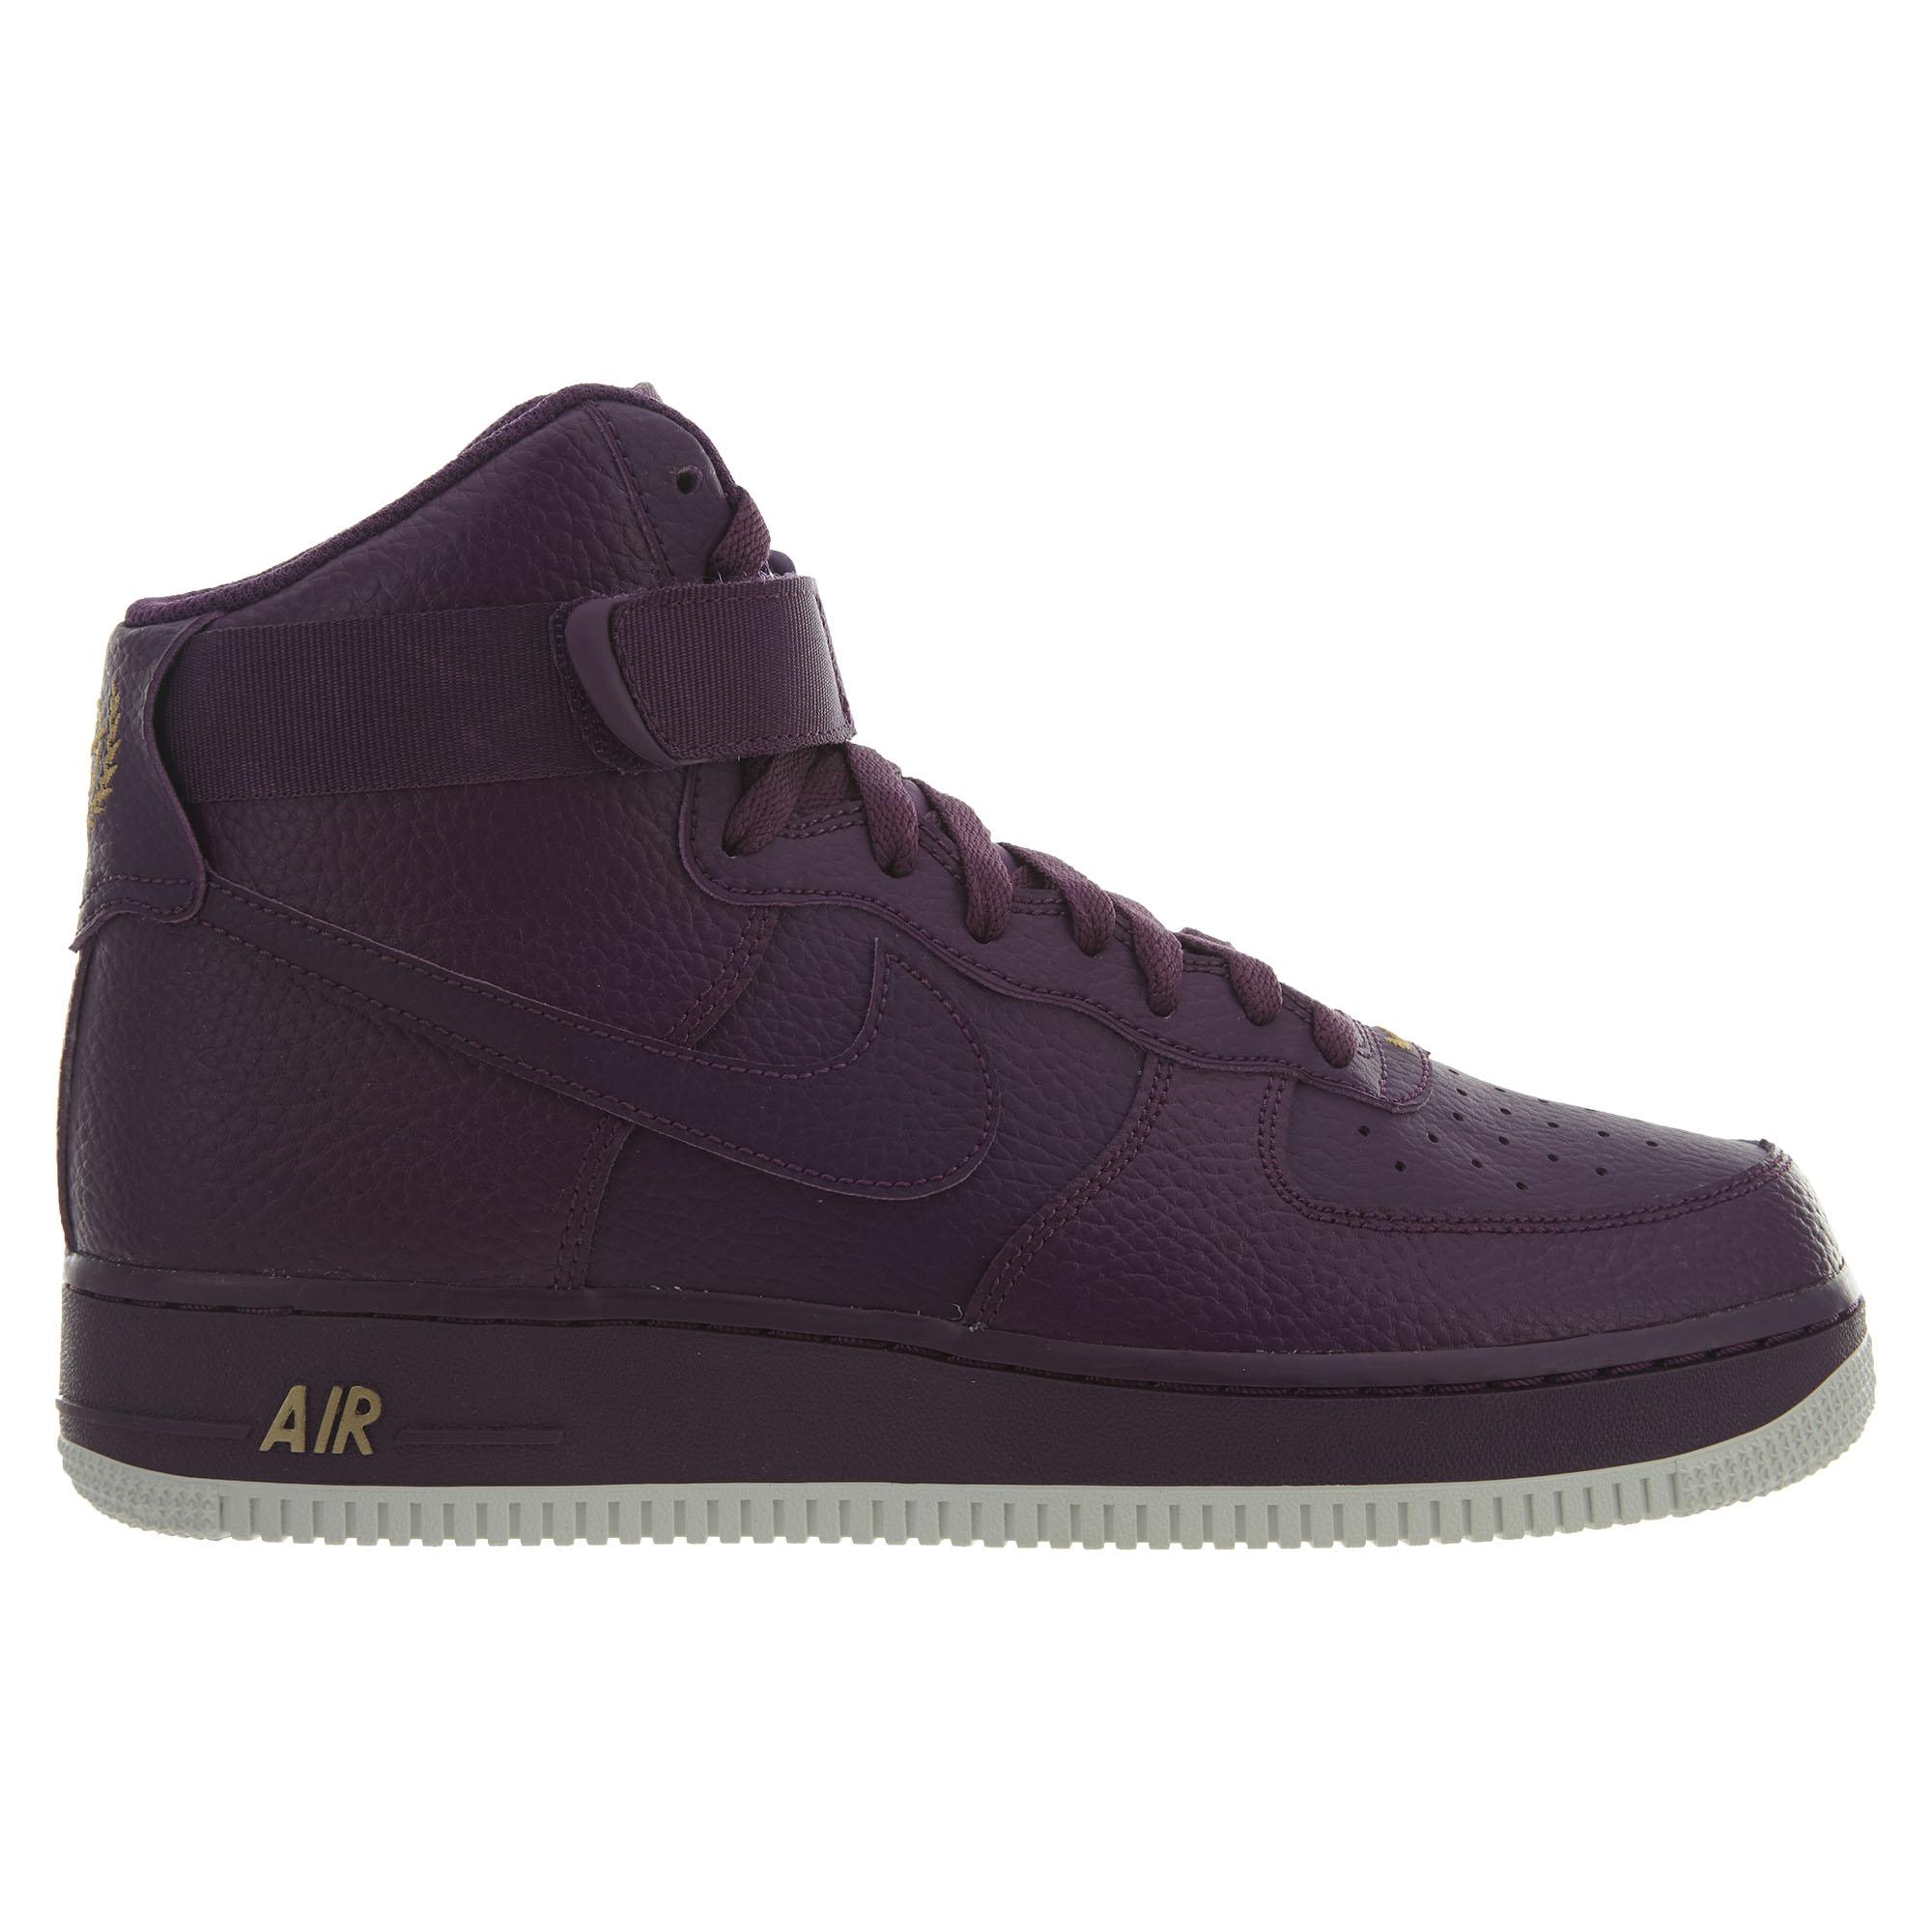 Nike Air Force 1 High 07 Night Purple